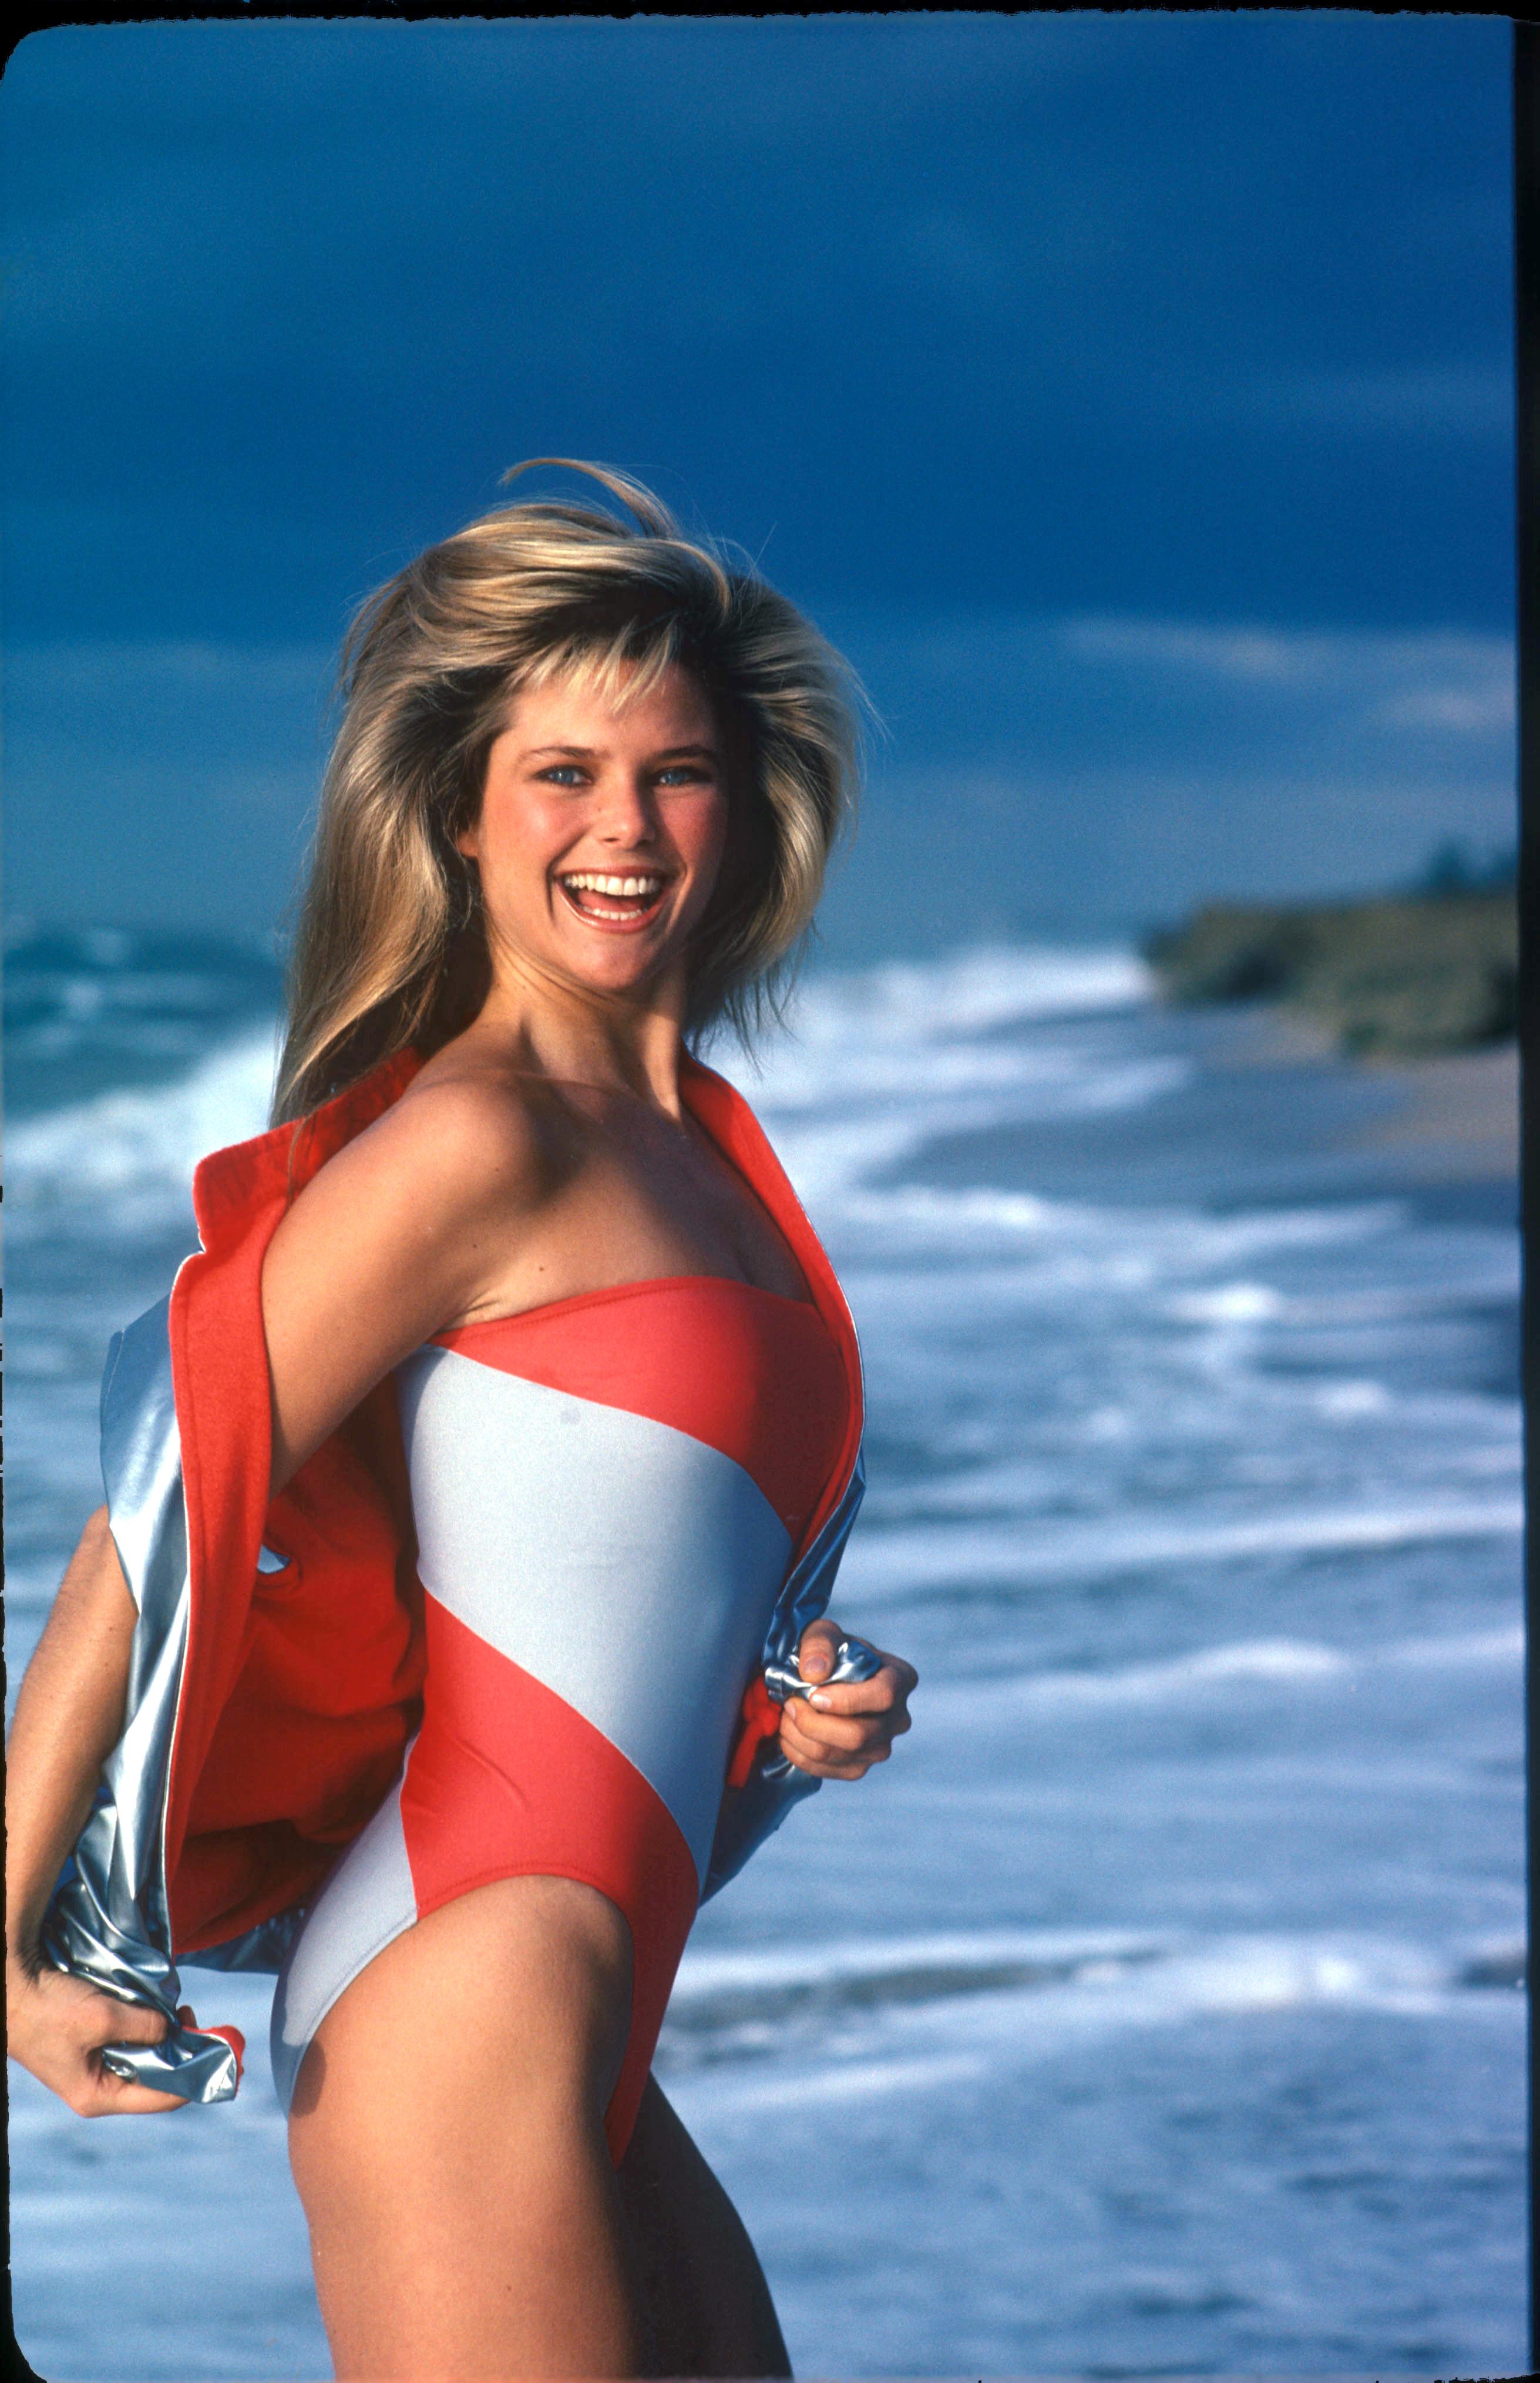 Sports Illustrated 1981 photoshoot